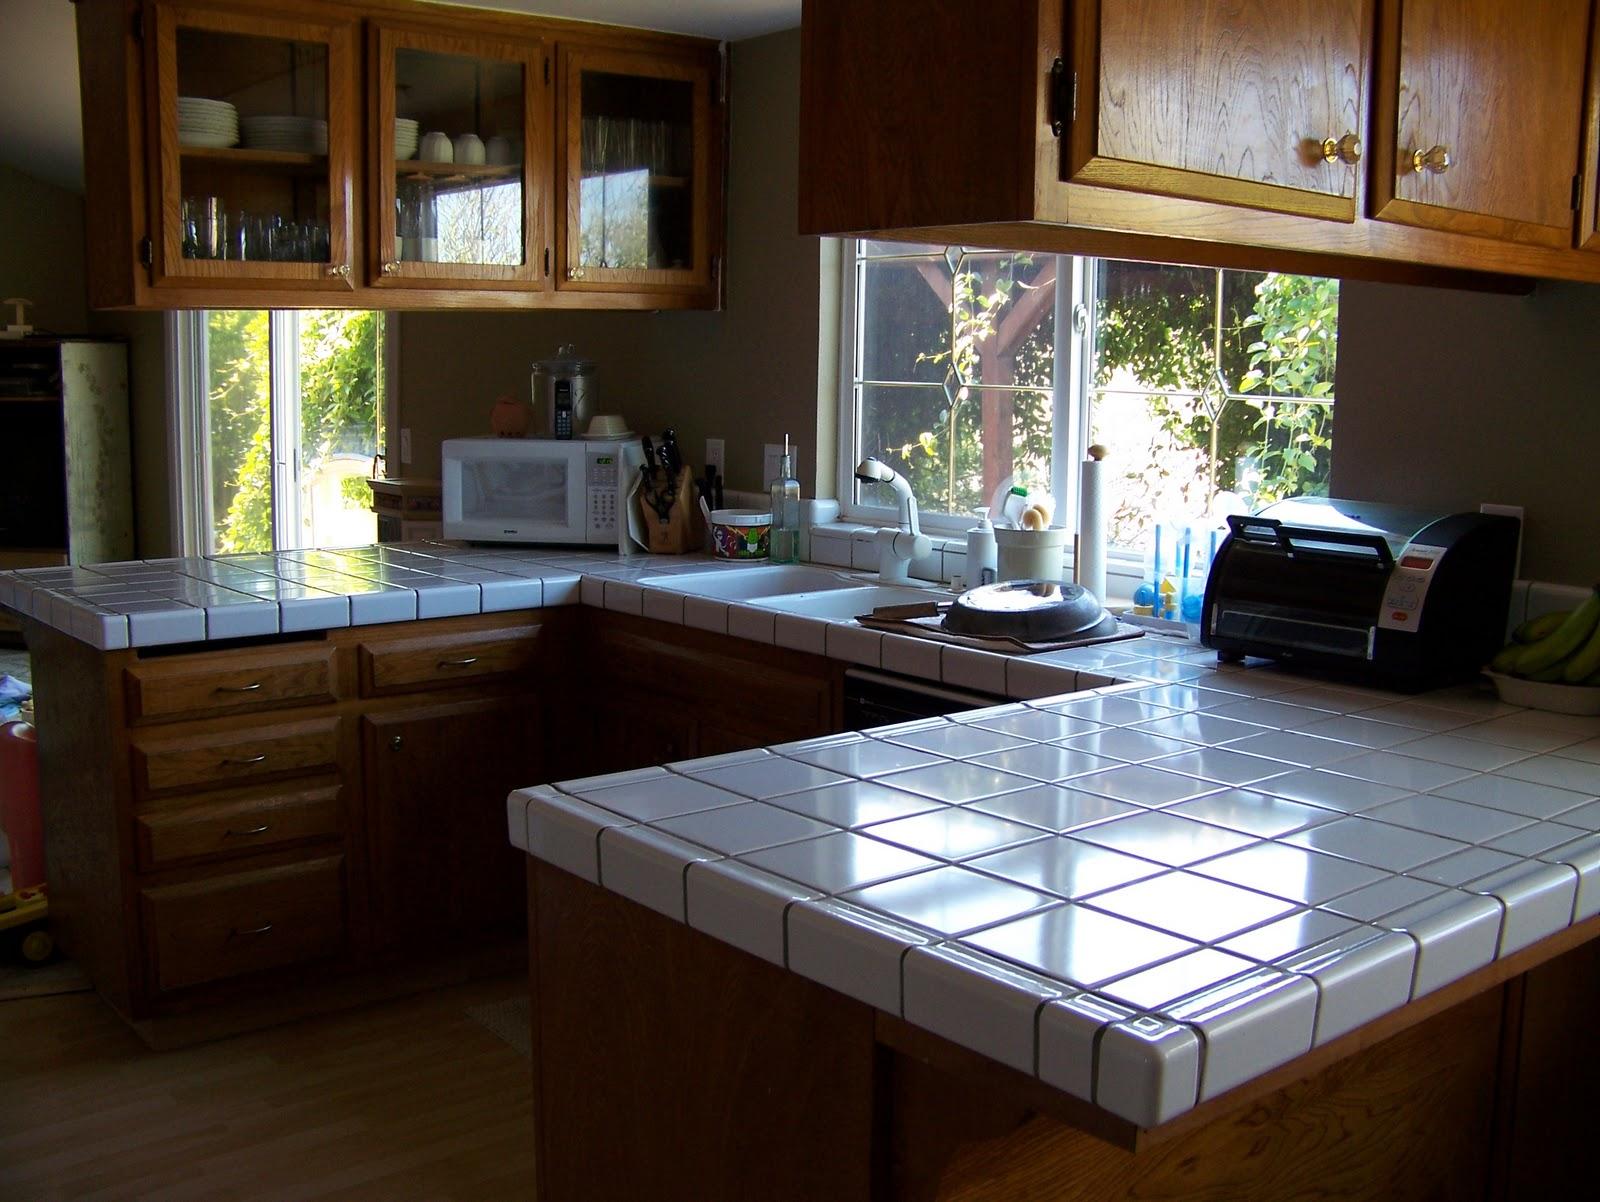 Kitchen Counter Organization Near To Nothing Kitchen Organization